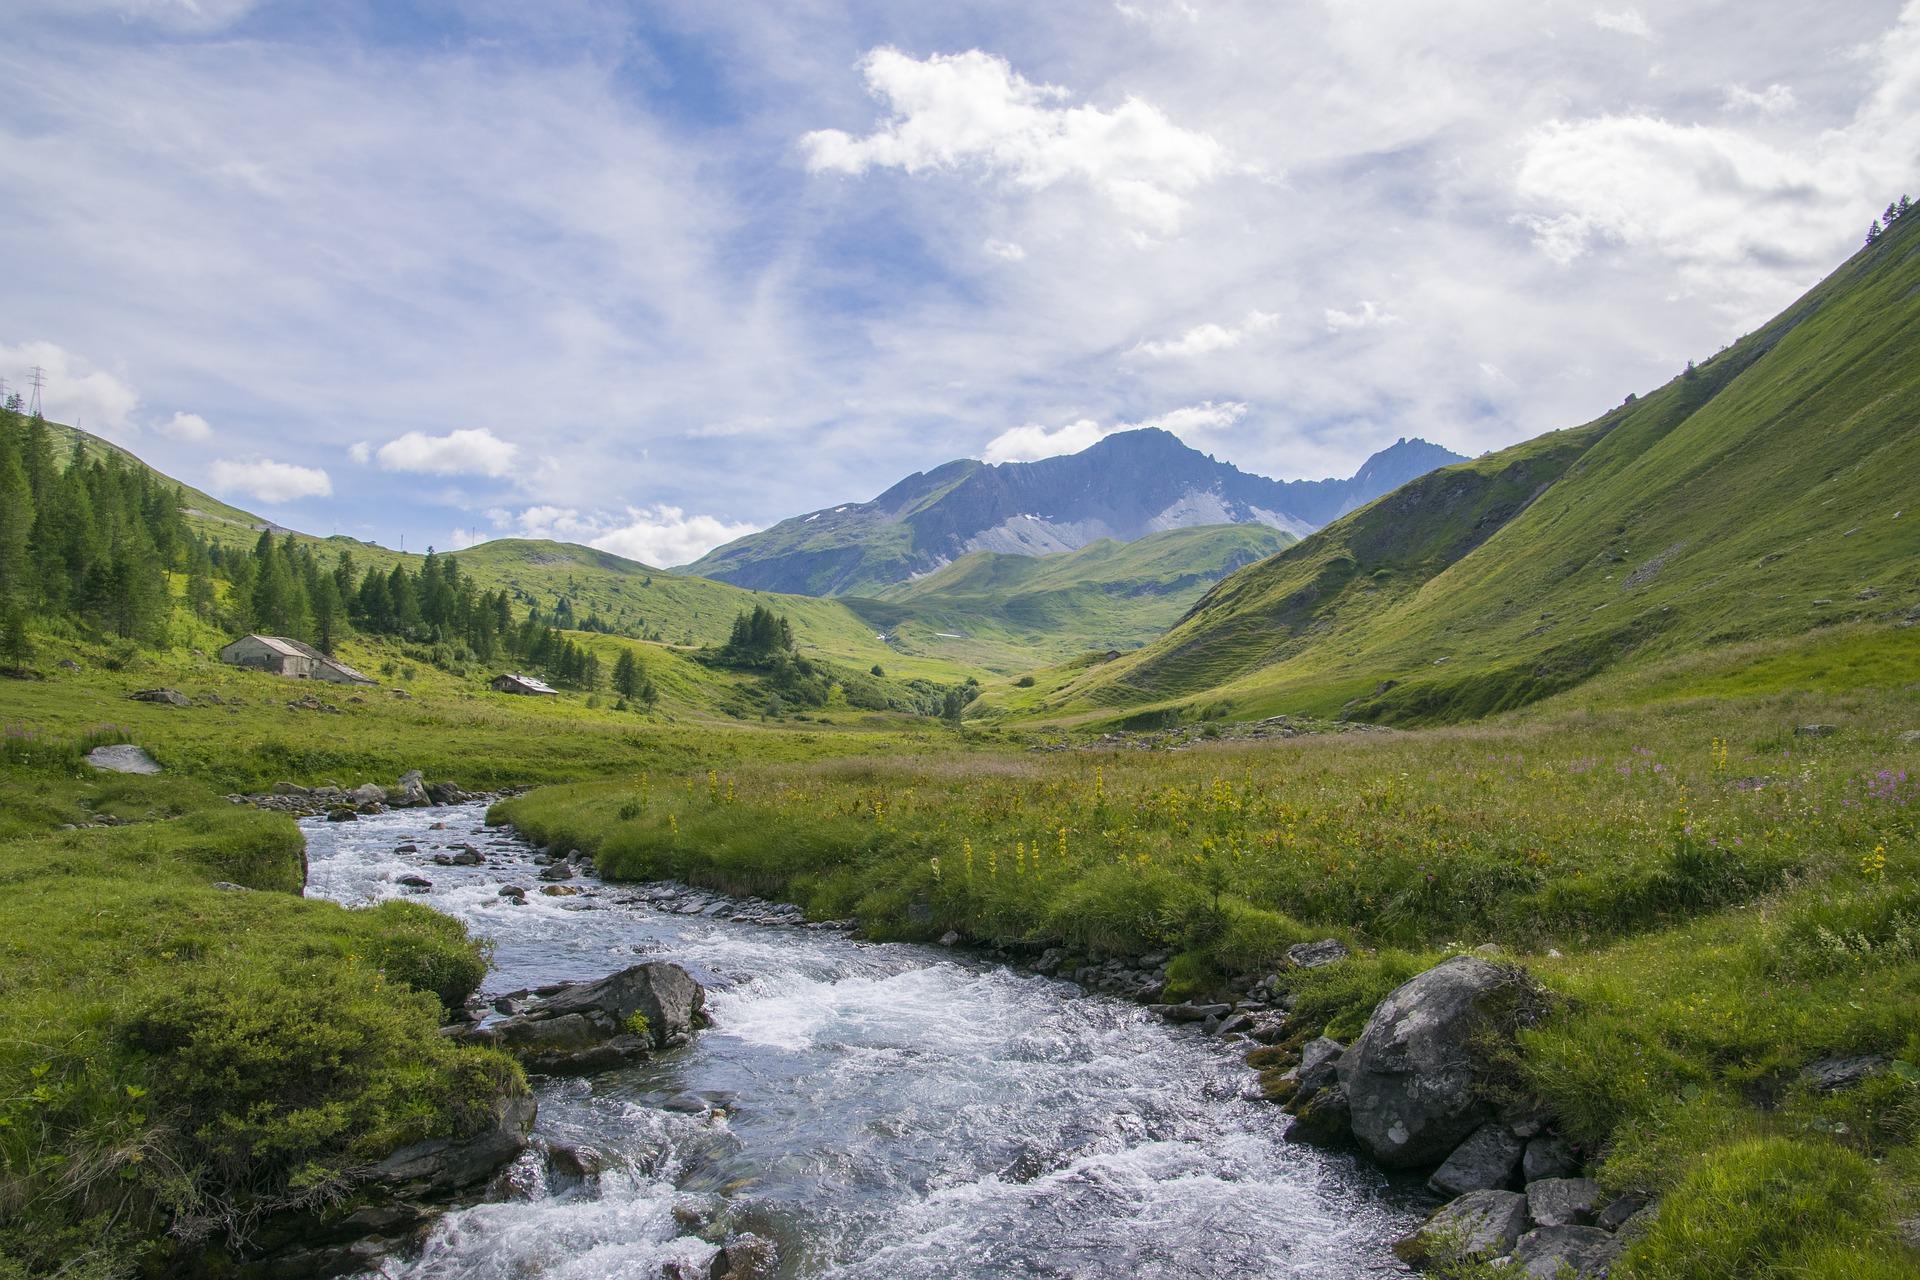 Omgeving Aosta